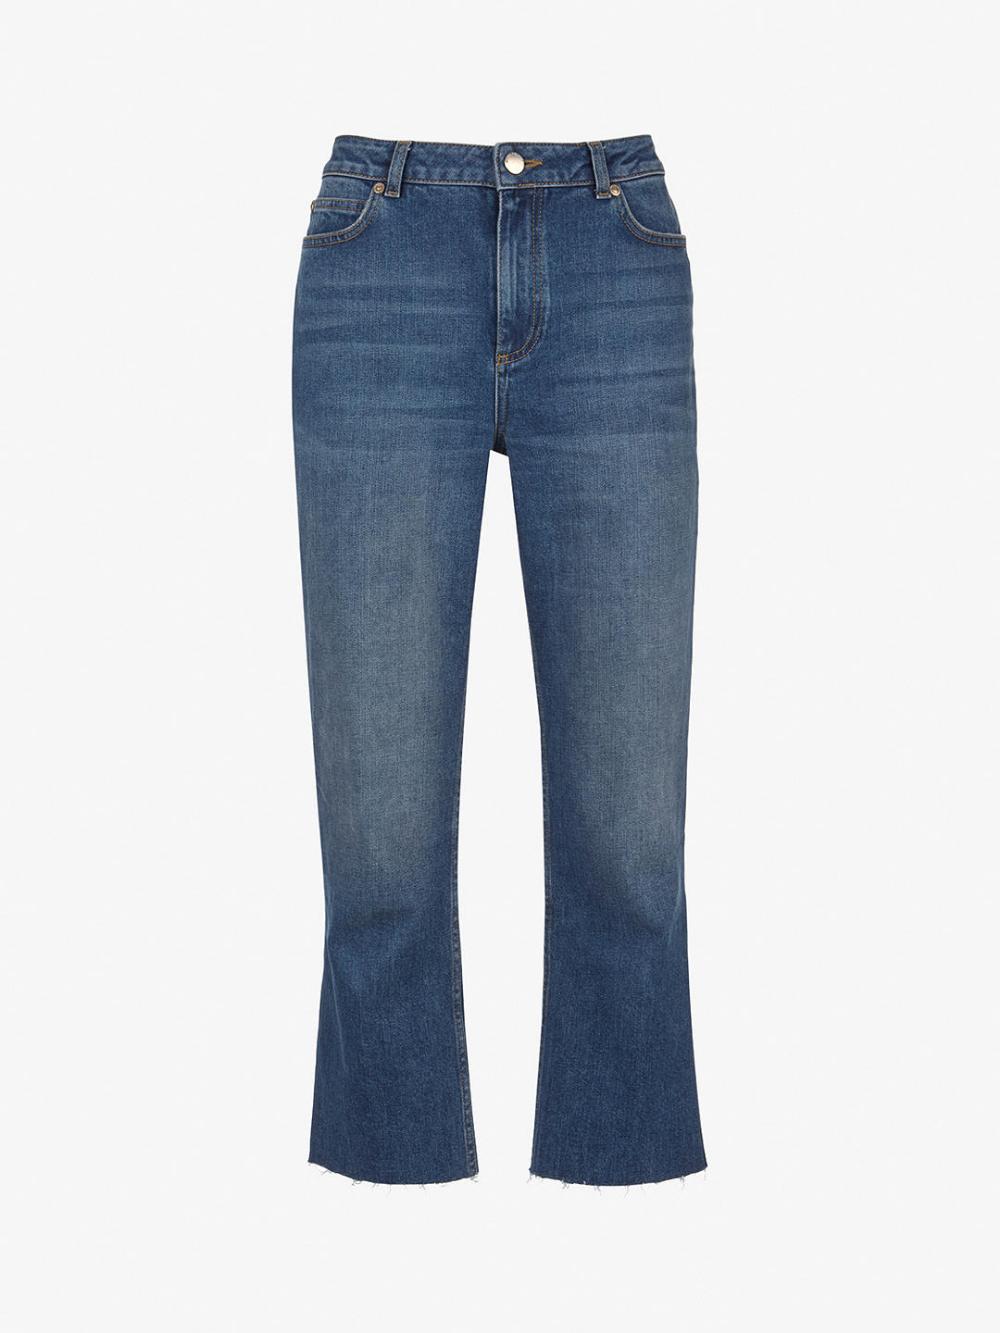 classic promo codes new products Mint Velvet Meribel Straight Jeans, Dark Blue | Actual ...